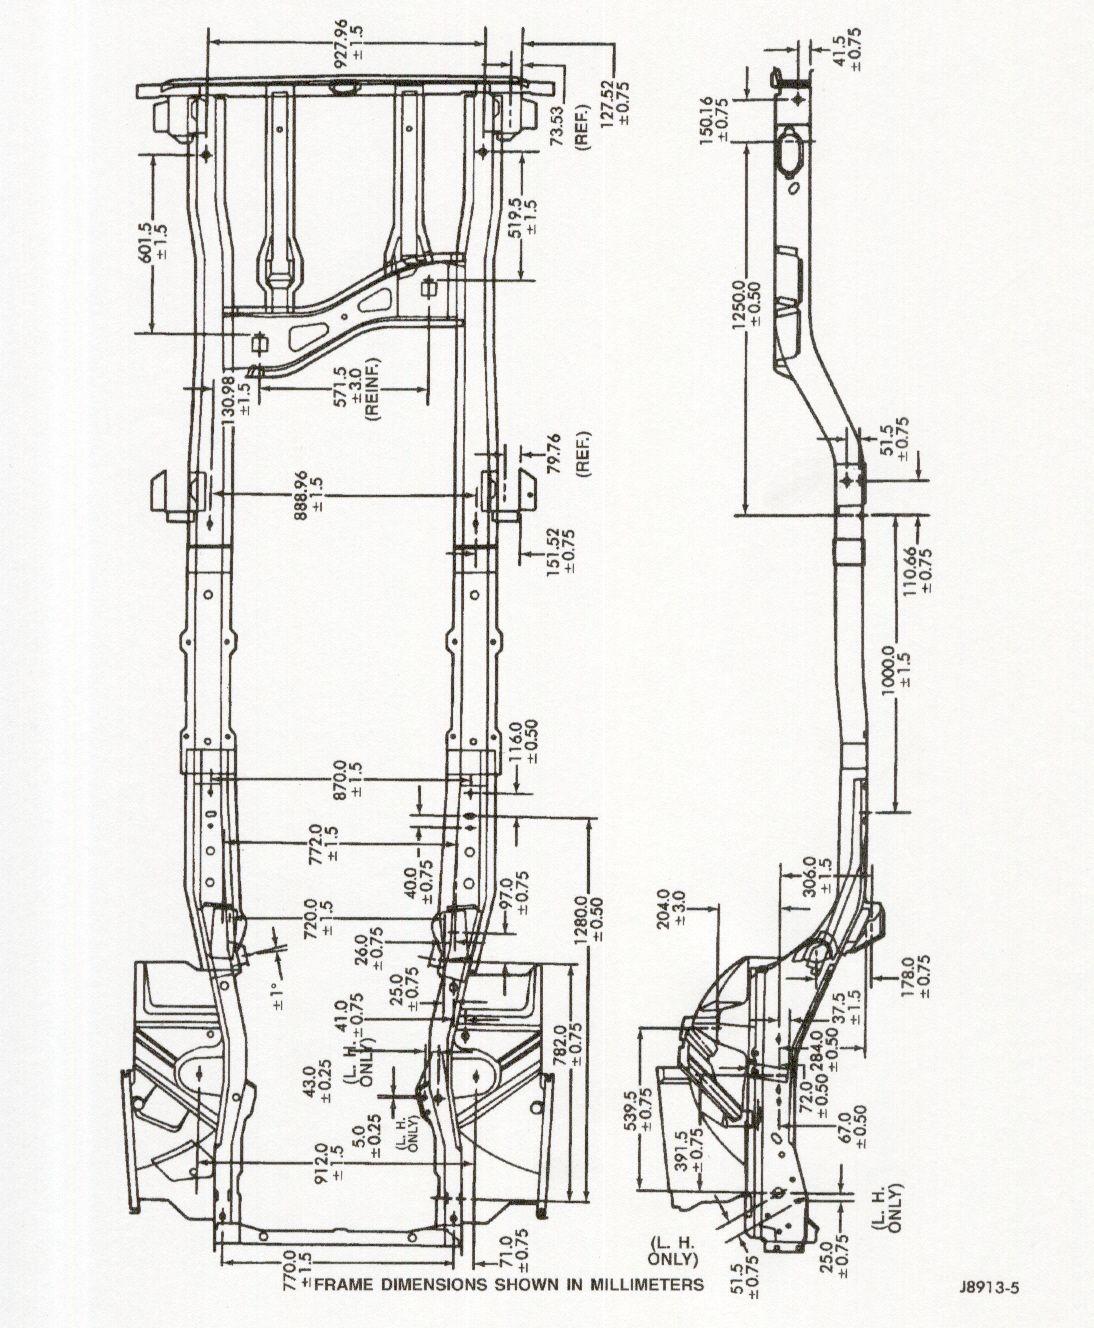 Pin By Michael Gilders On Xj Ideas